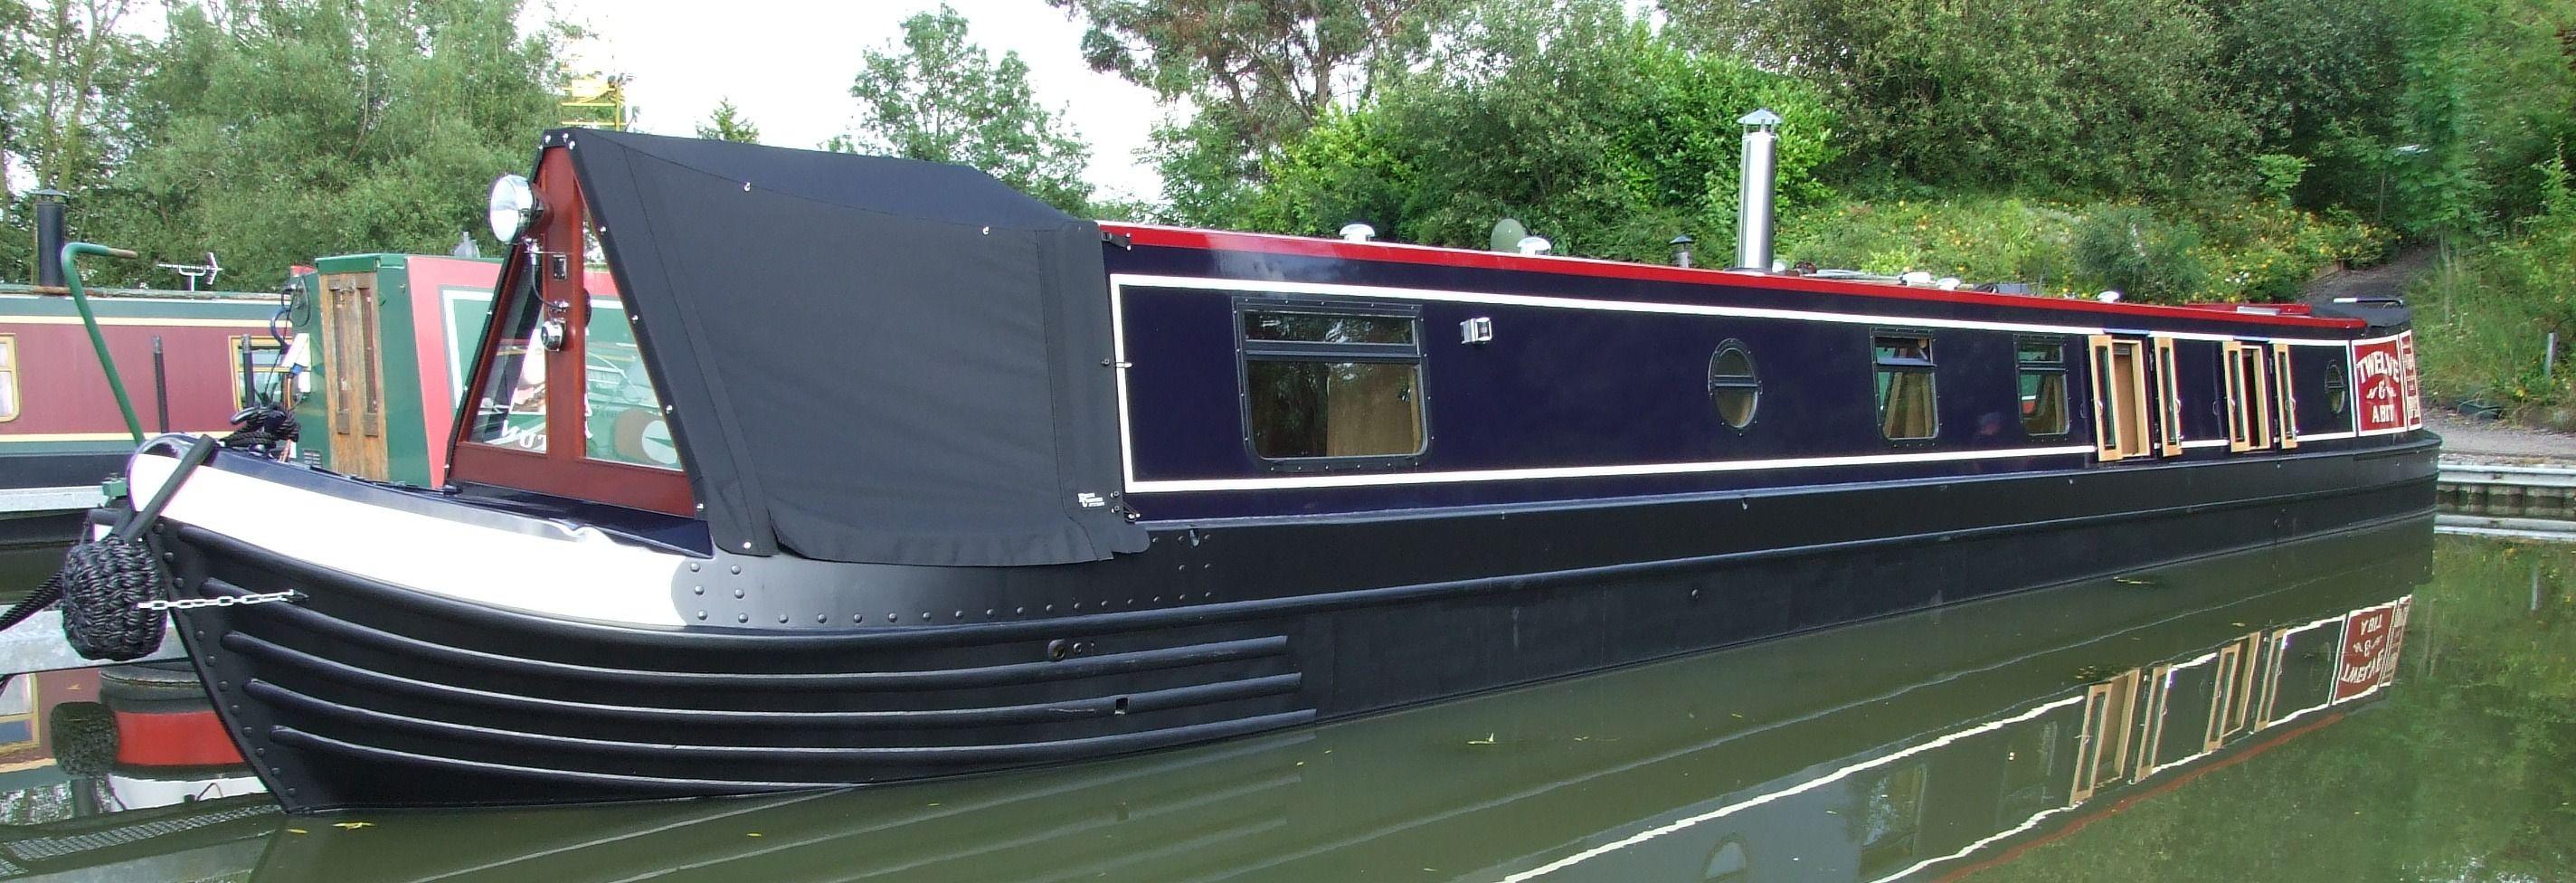 narrowboat builders ~ bespoke narrowboats ~ narrowboat fitters - home page